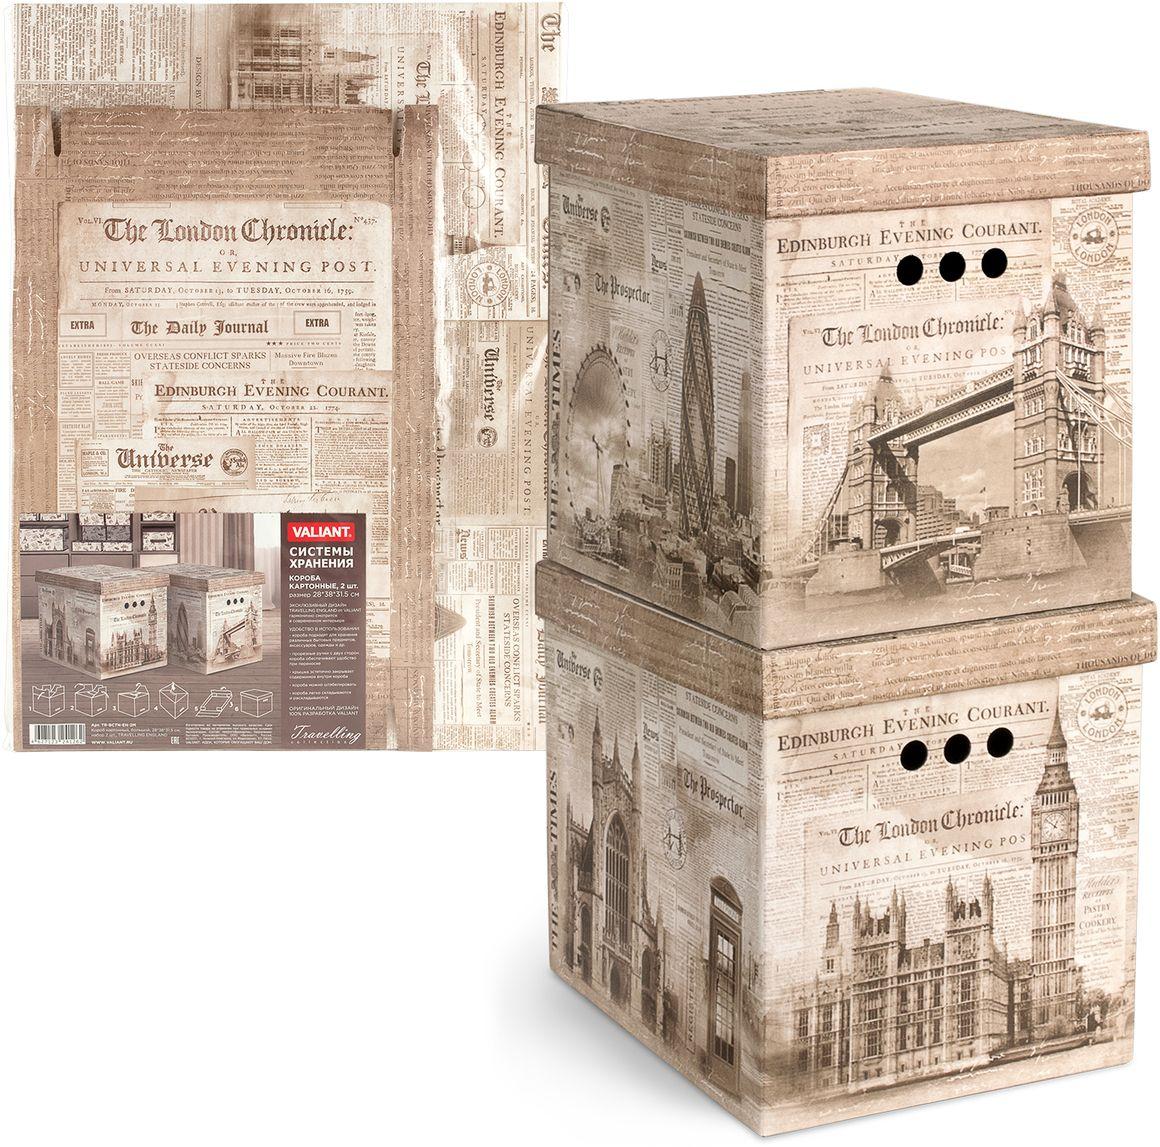 Набор коробок Valiant Travelling England, складных, 28  38  31,5 см,  шт